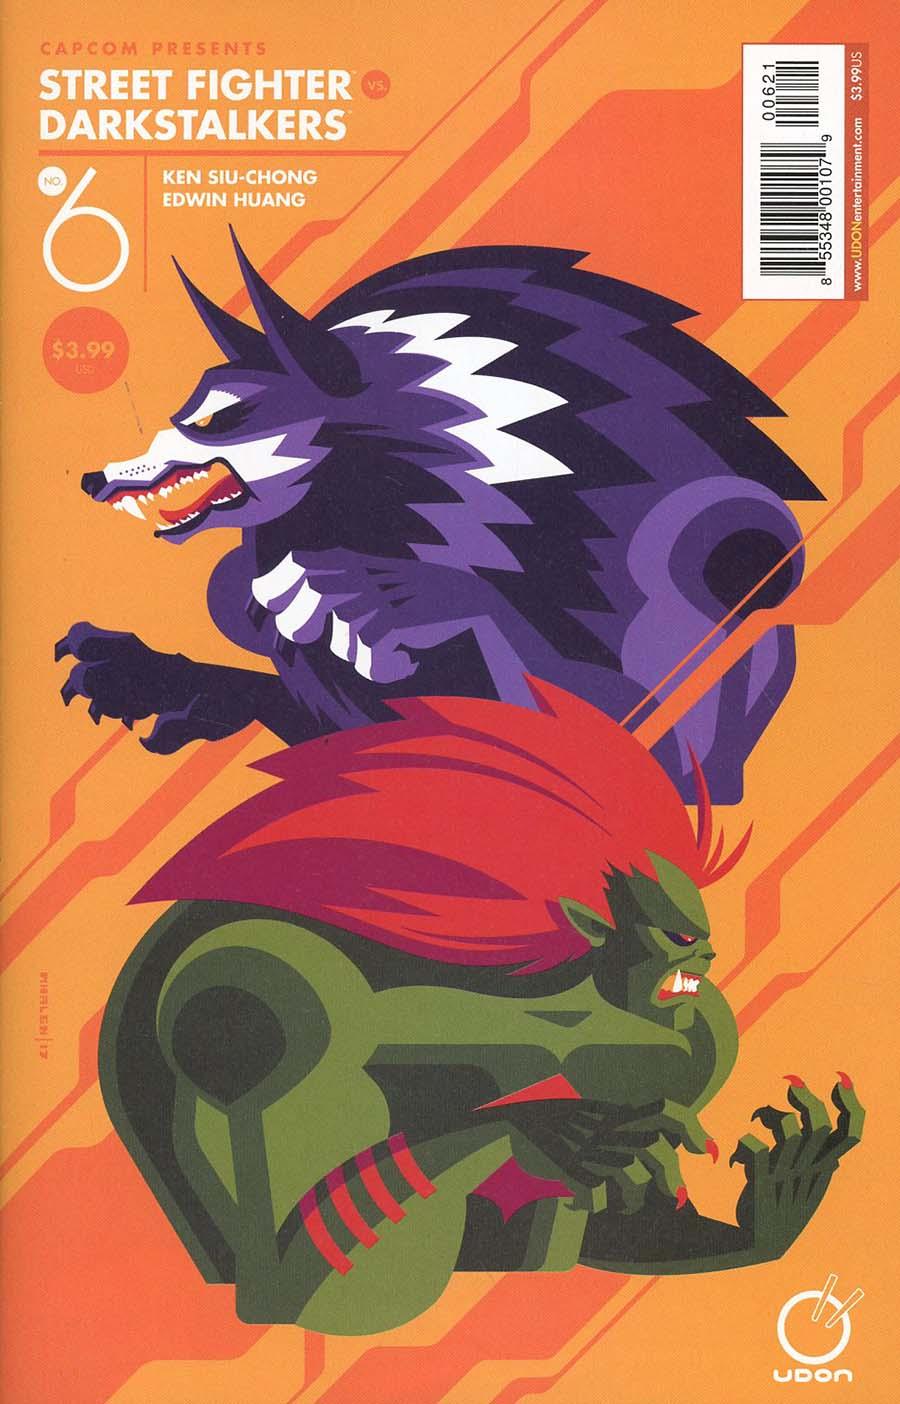 Street Fighter vs Darkstalkers #6 Cover B Variant Tom Whalen Guest Artist Cover